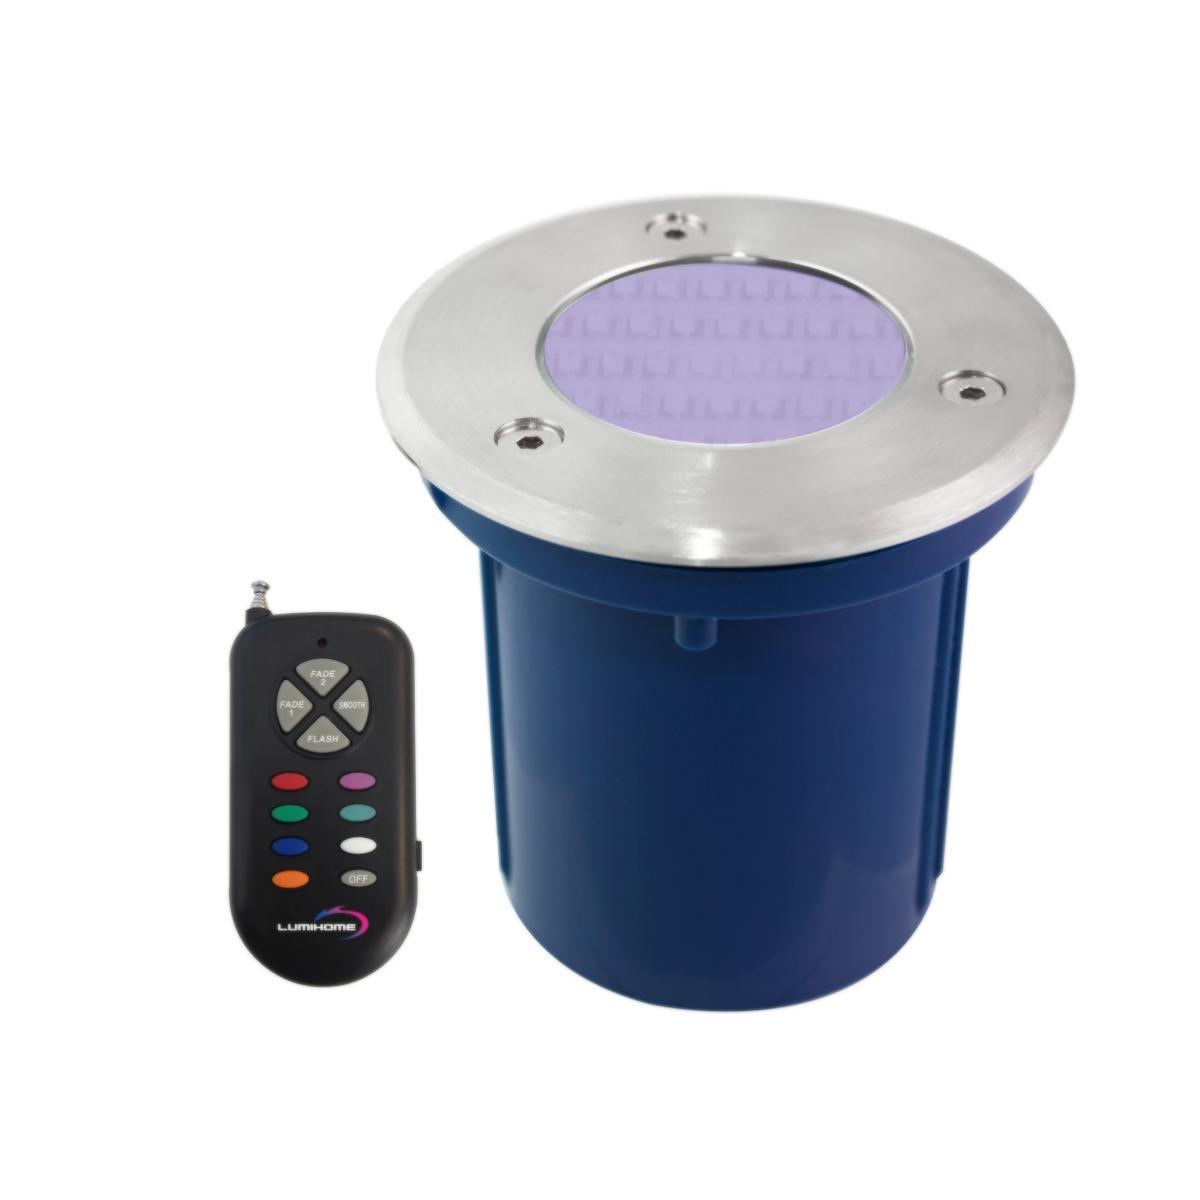 spot led rgb encastrable inox 316 pour abords piscine 2w. Black Bedroom Furniture Sets. Home Design Ideas